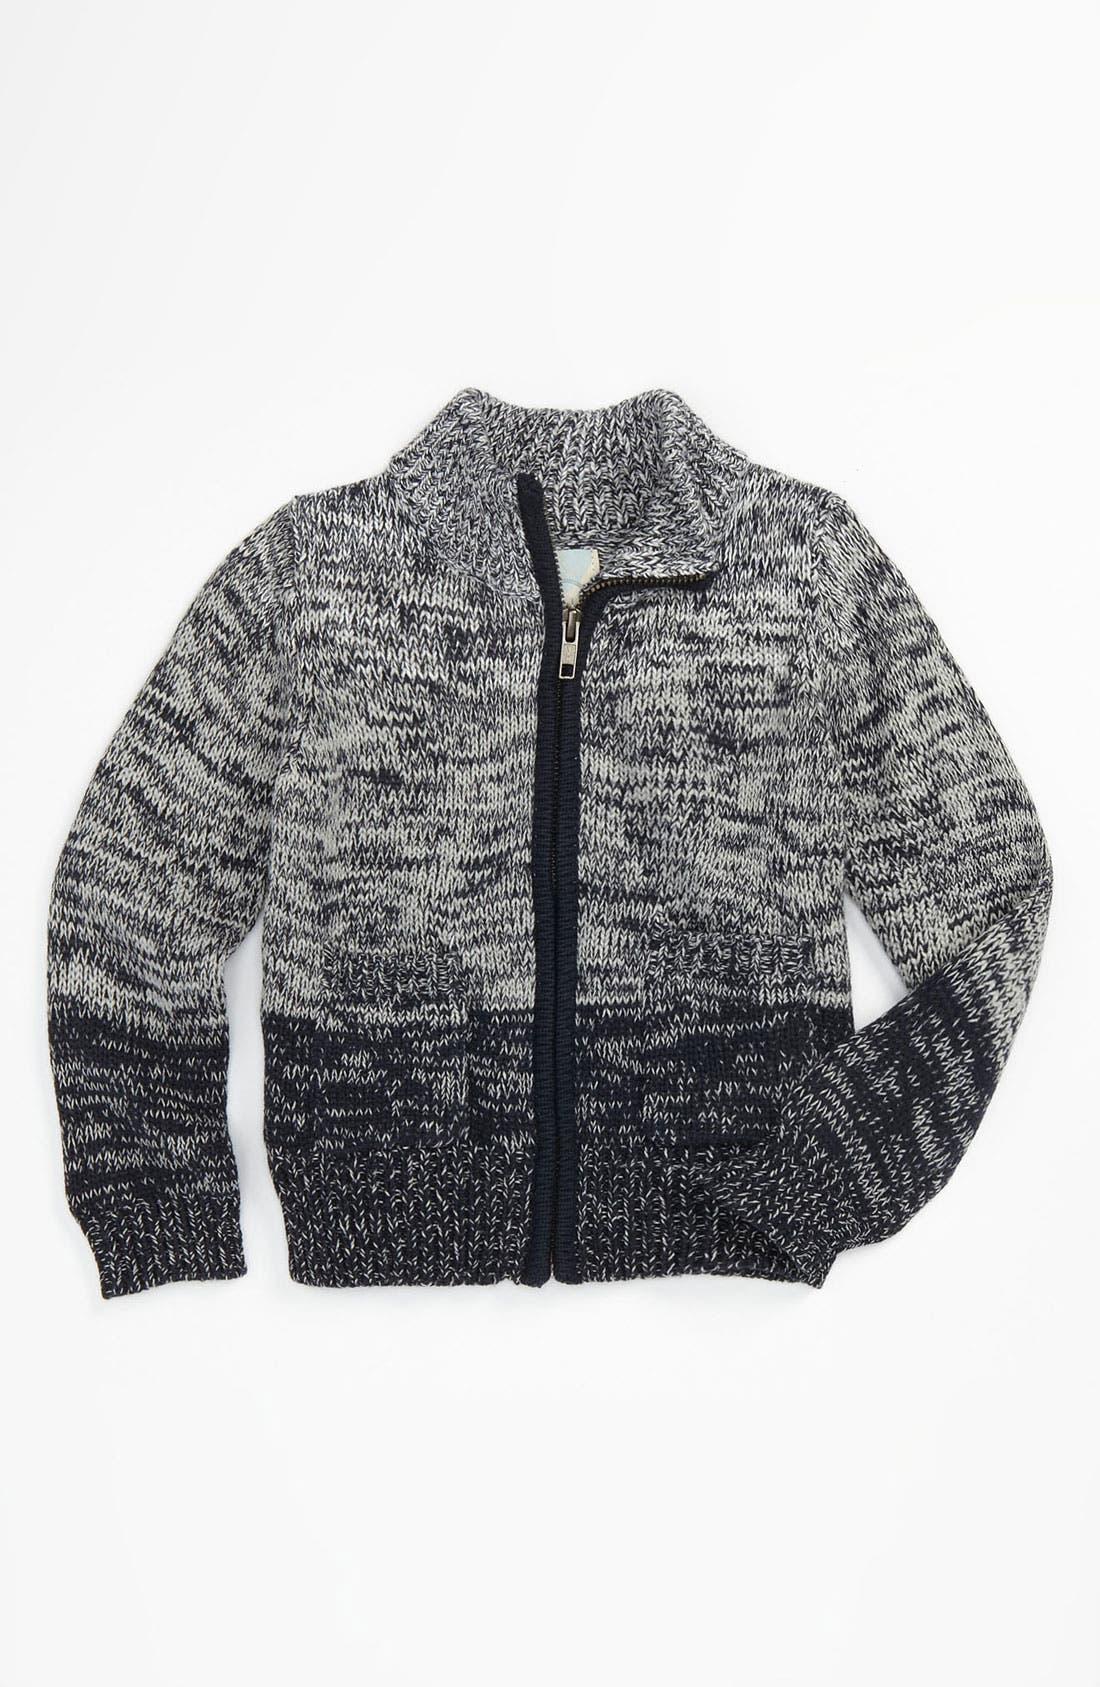 Main Image - Peek 'Gerard' Ombré Sweater (Infant)